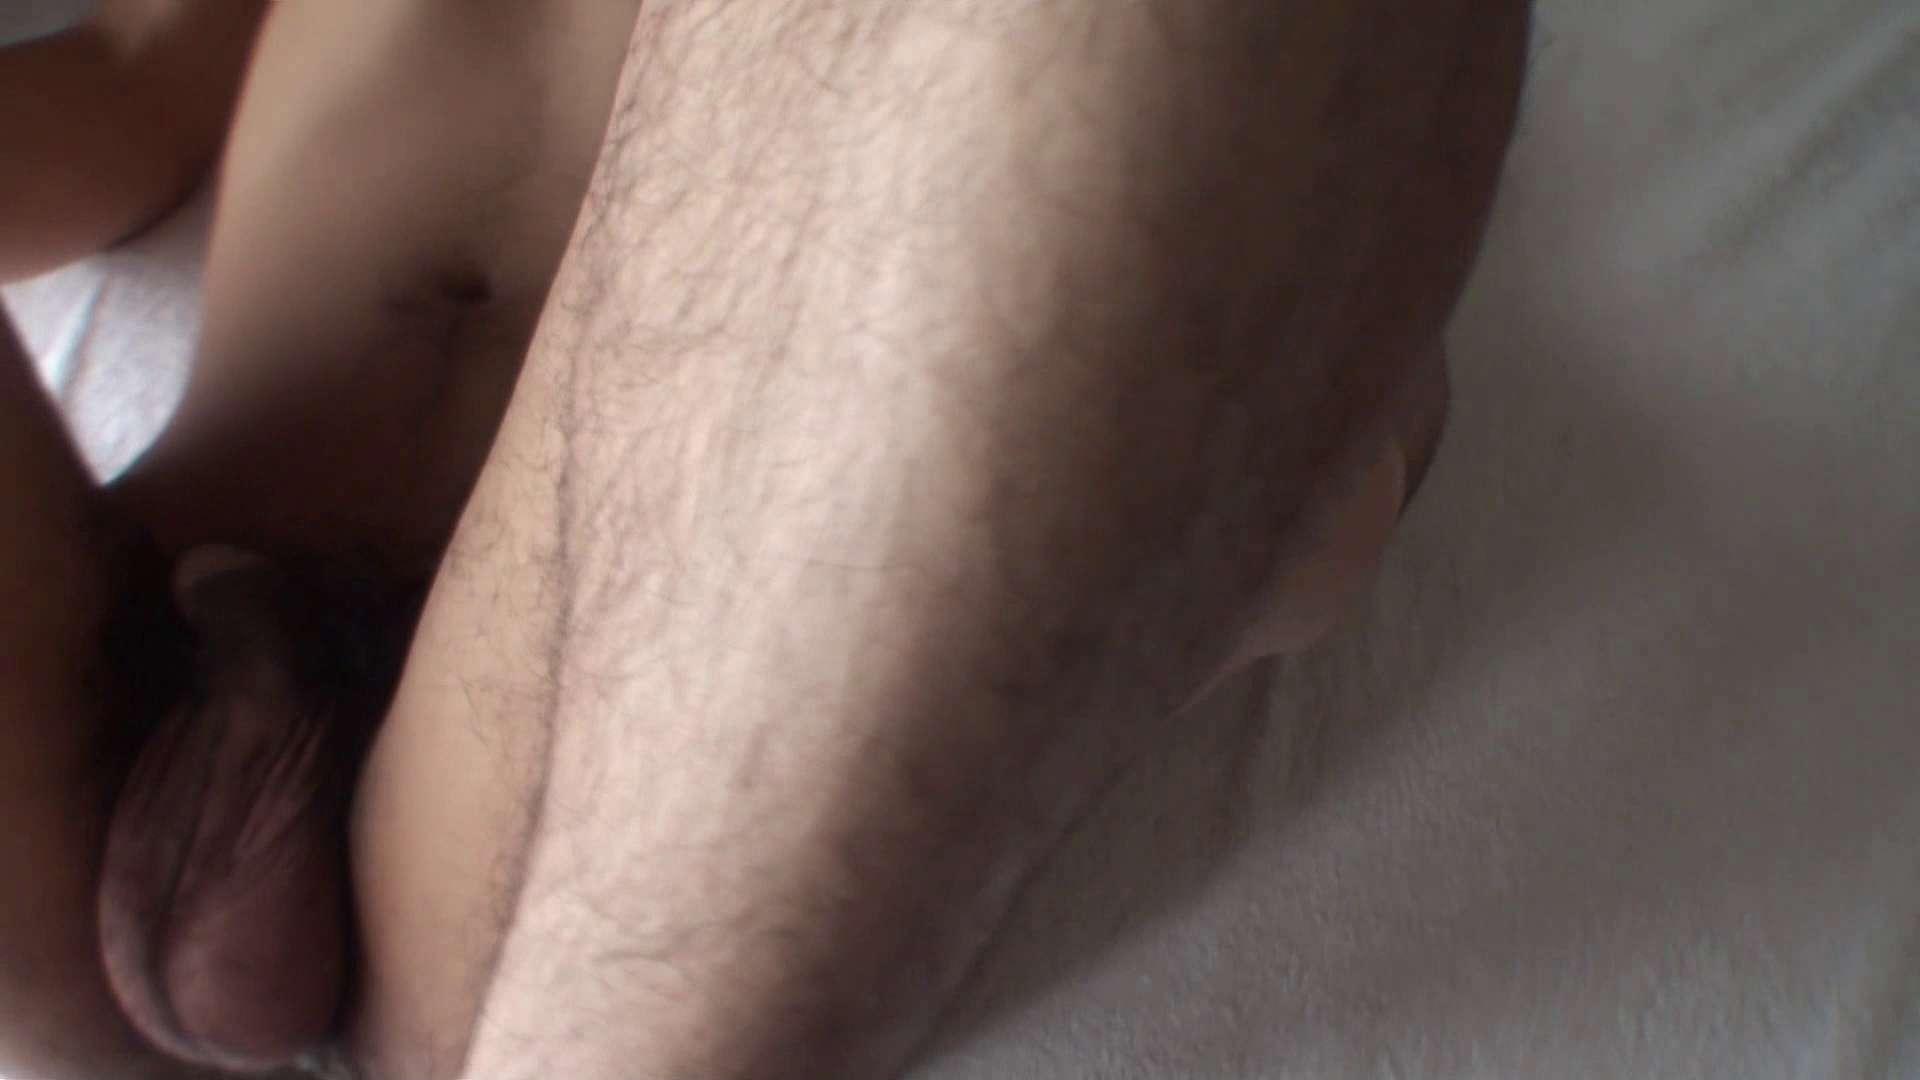 HD 良太と健二当たり前の日常 セックス編 セックス特集 ゲイアダルトビデオ画像 65枚 28